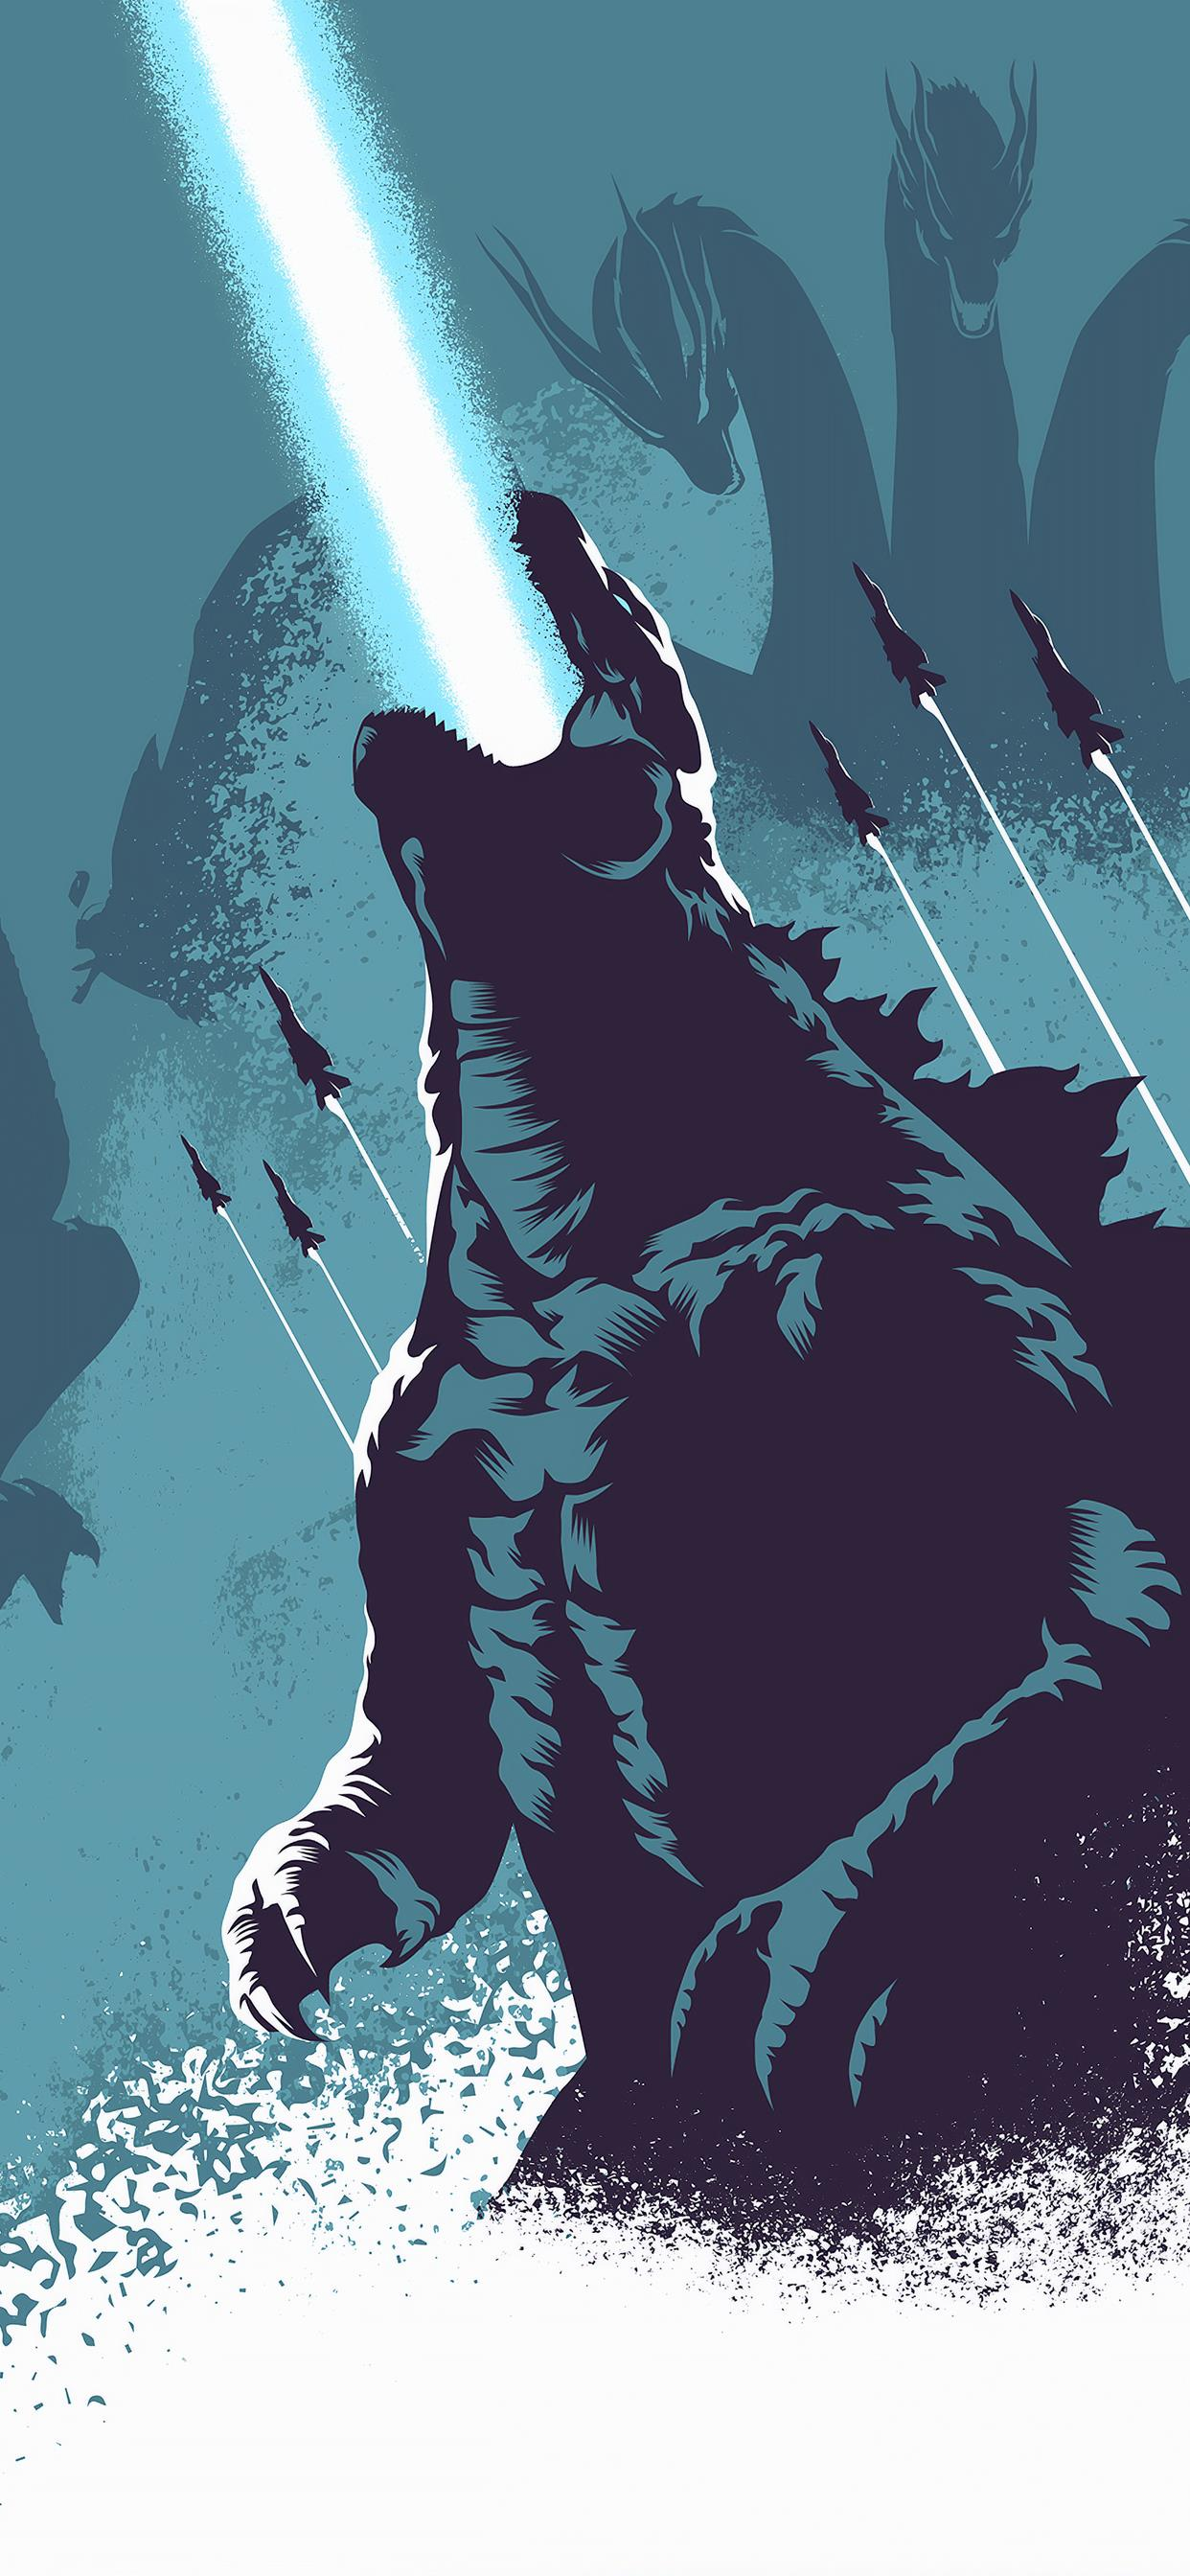 Godzilla 4k 2019 Iphone X Wallpapers Free Download